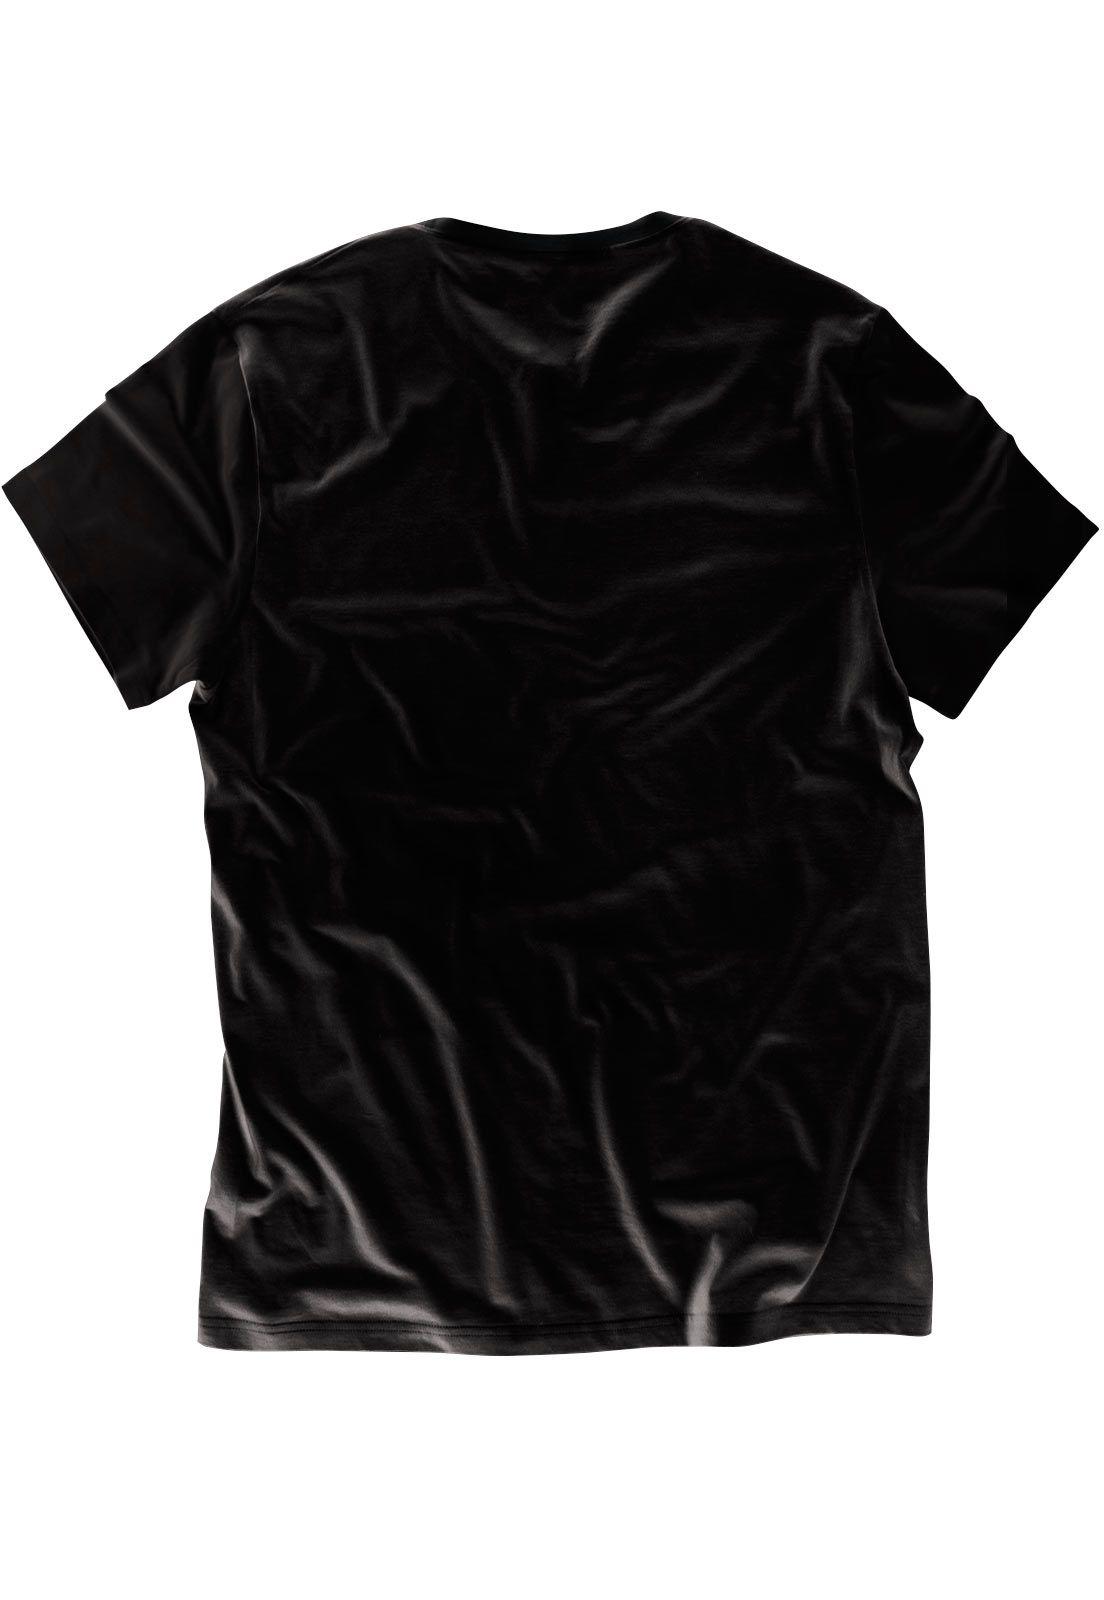 Camiseta ElephunK Estampada Geek Marvelous Preta